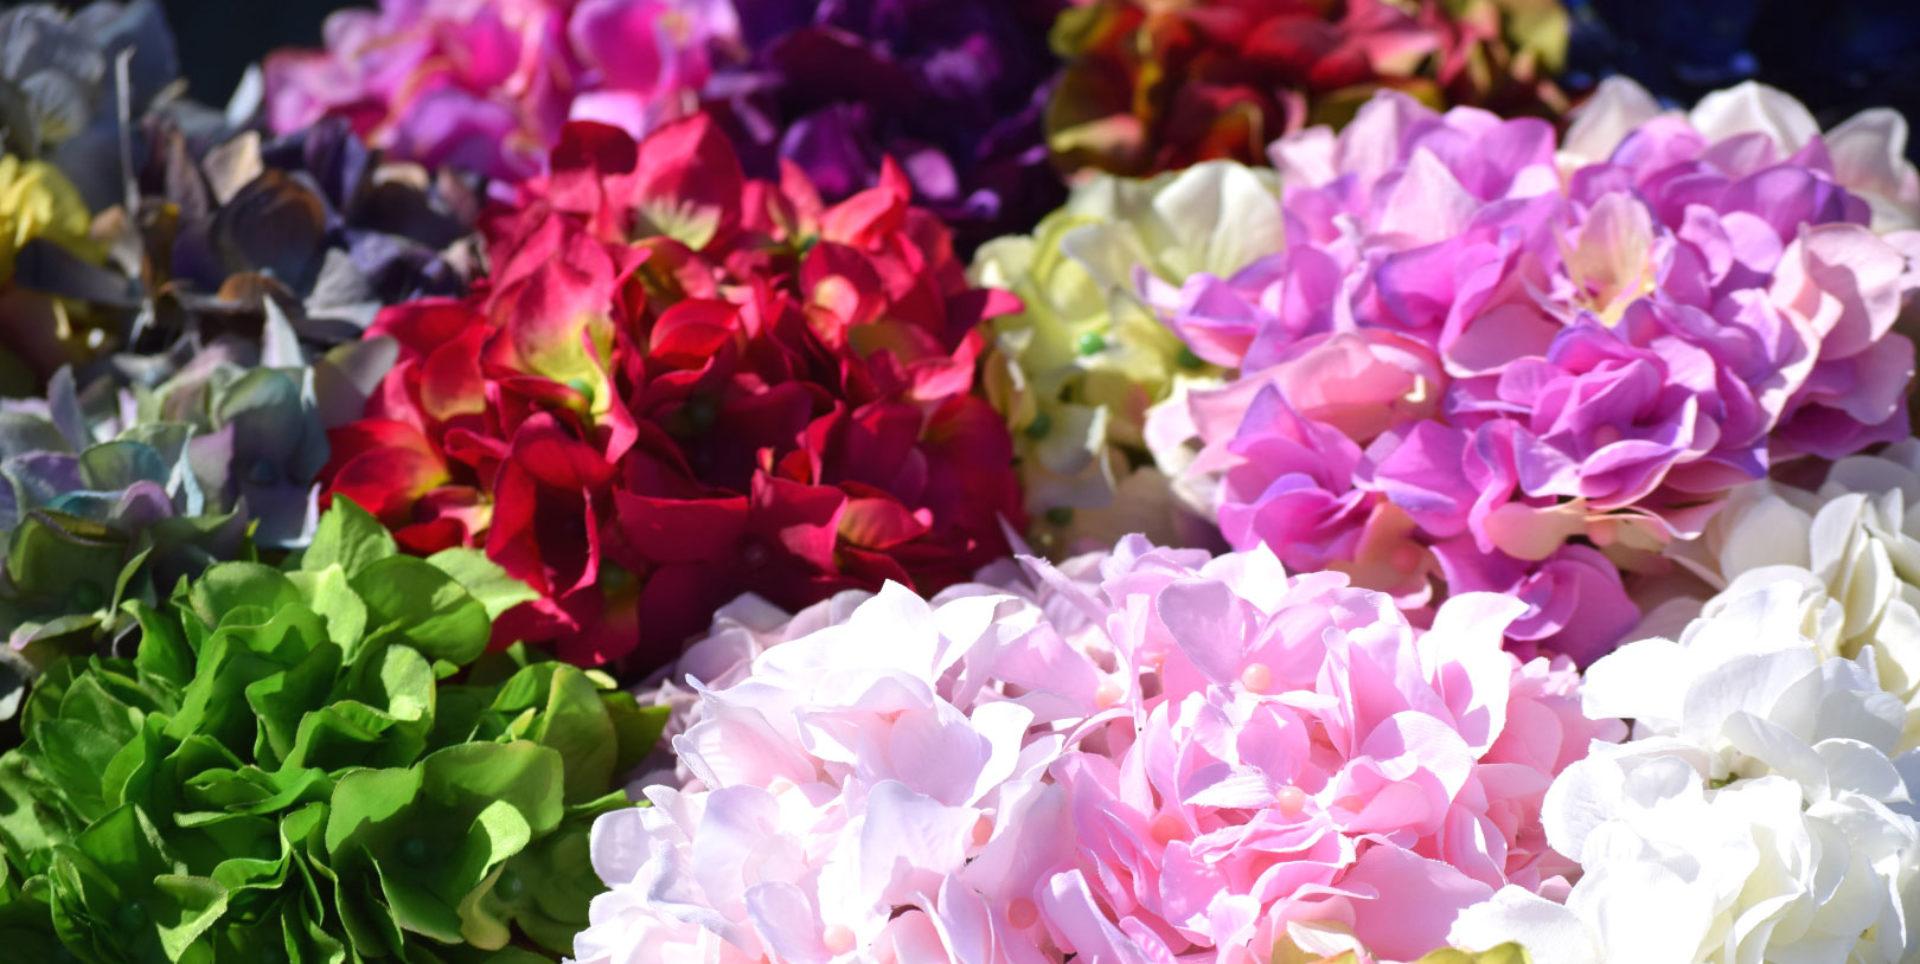 オクト展示場 | 九州・熊本の花材販売・卸売問屋|東京堂正規代理店